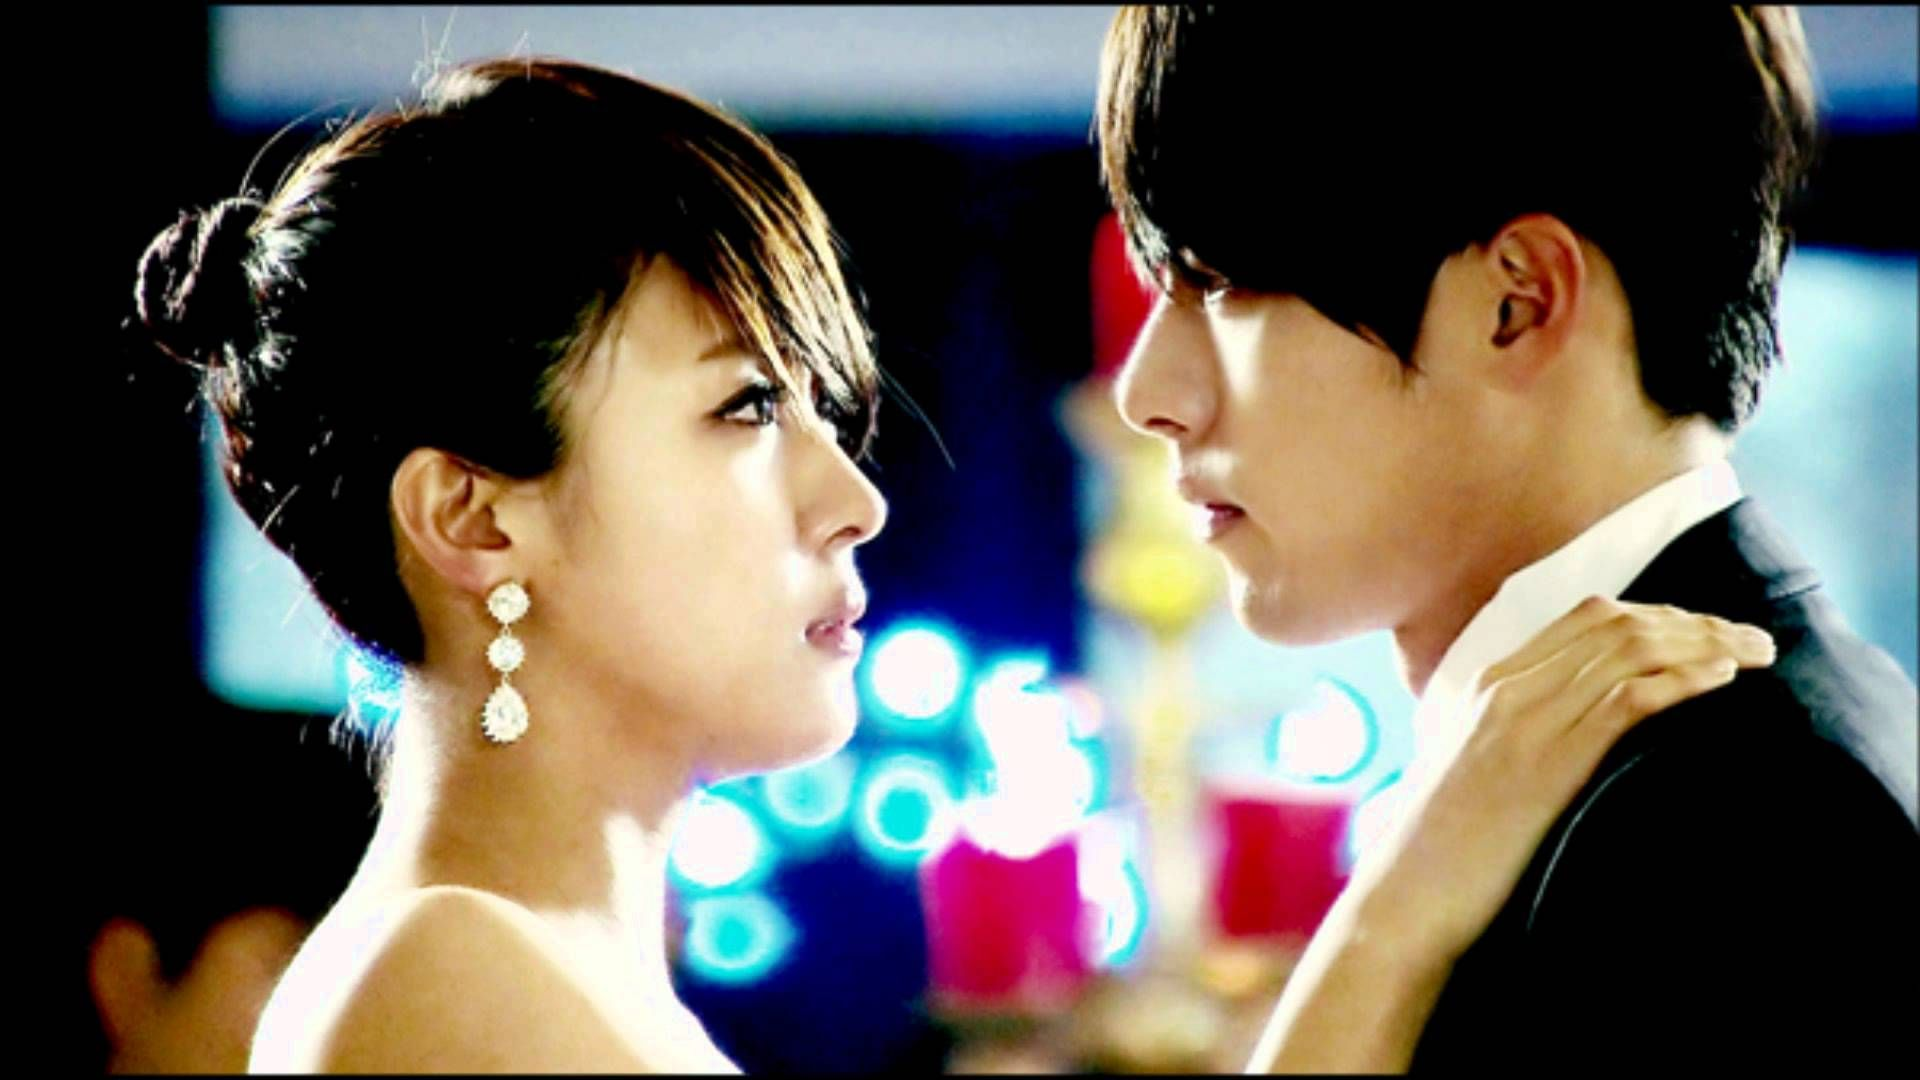 4Men (신용재) Feat. Mi (美) - Here I Am [Secret Garden OST